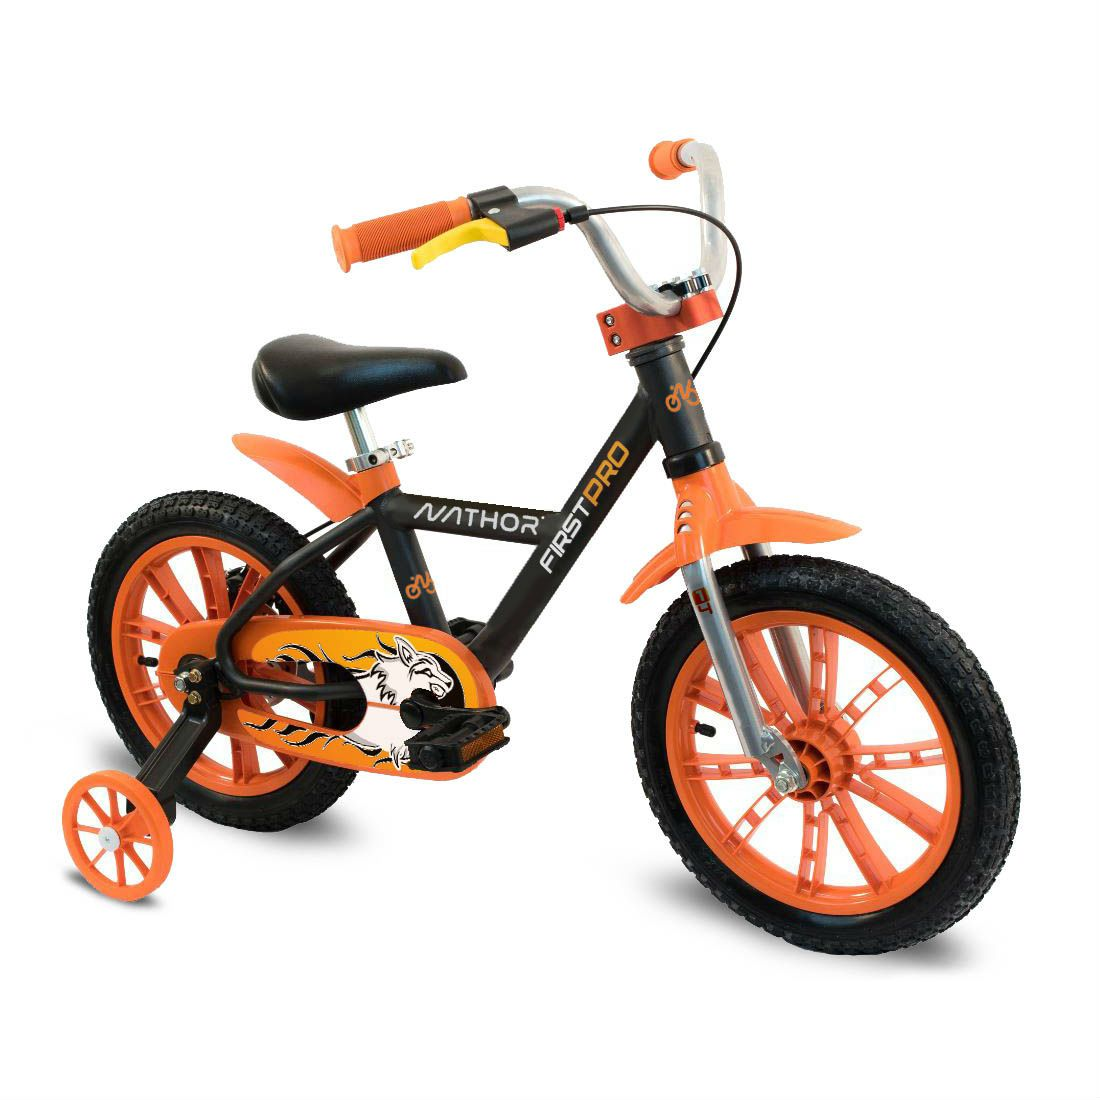 Bicicleta Aro 14 - First Pro - Masculina - Nathor